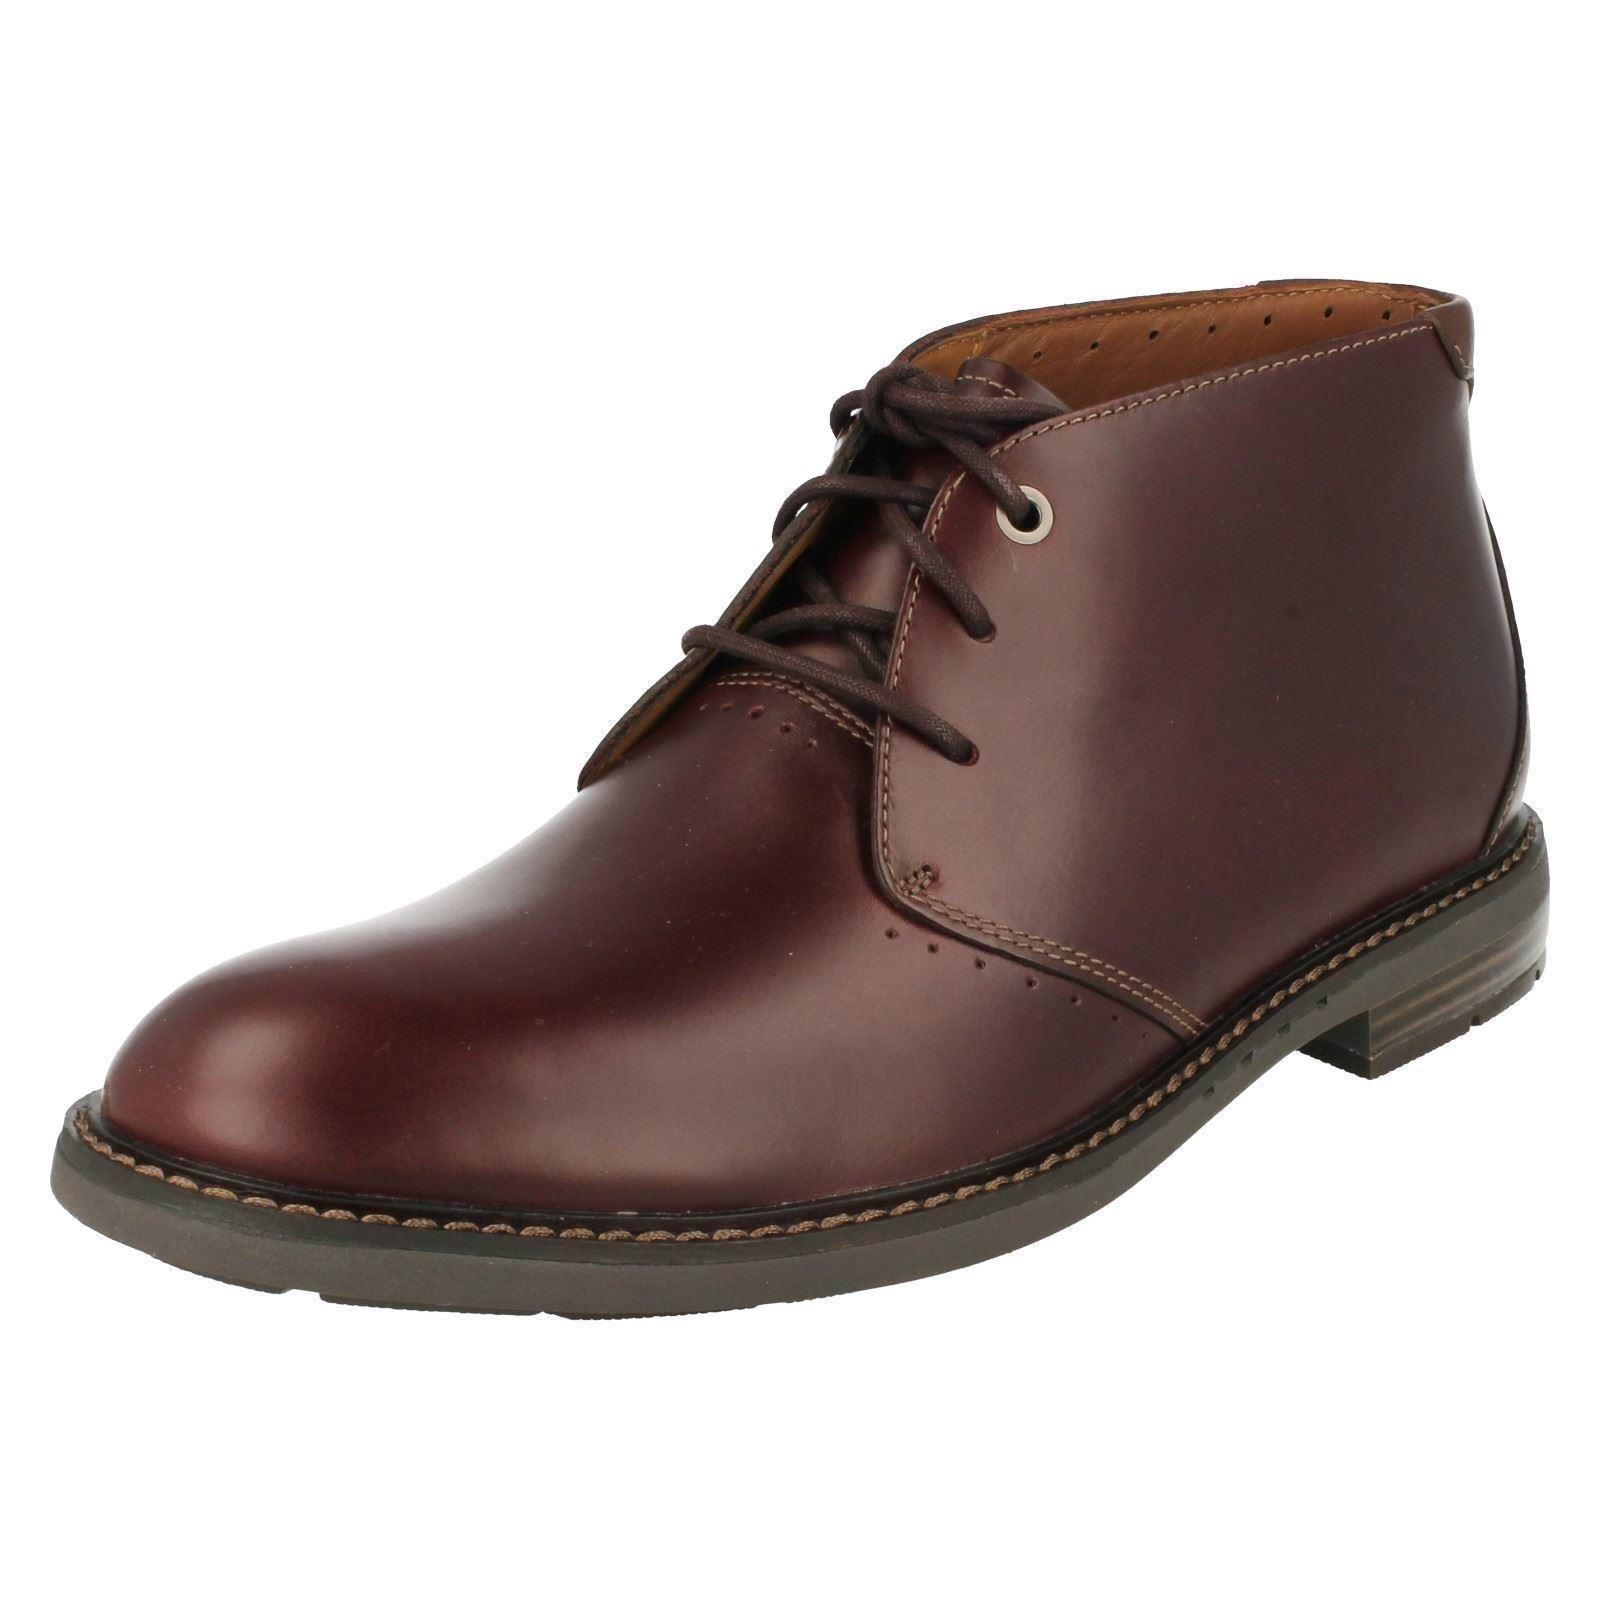 Men's Clarks Unstructured Unelott Mid Ankle Lace Boot Burgundy Leather 26120330